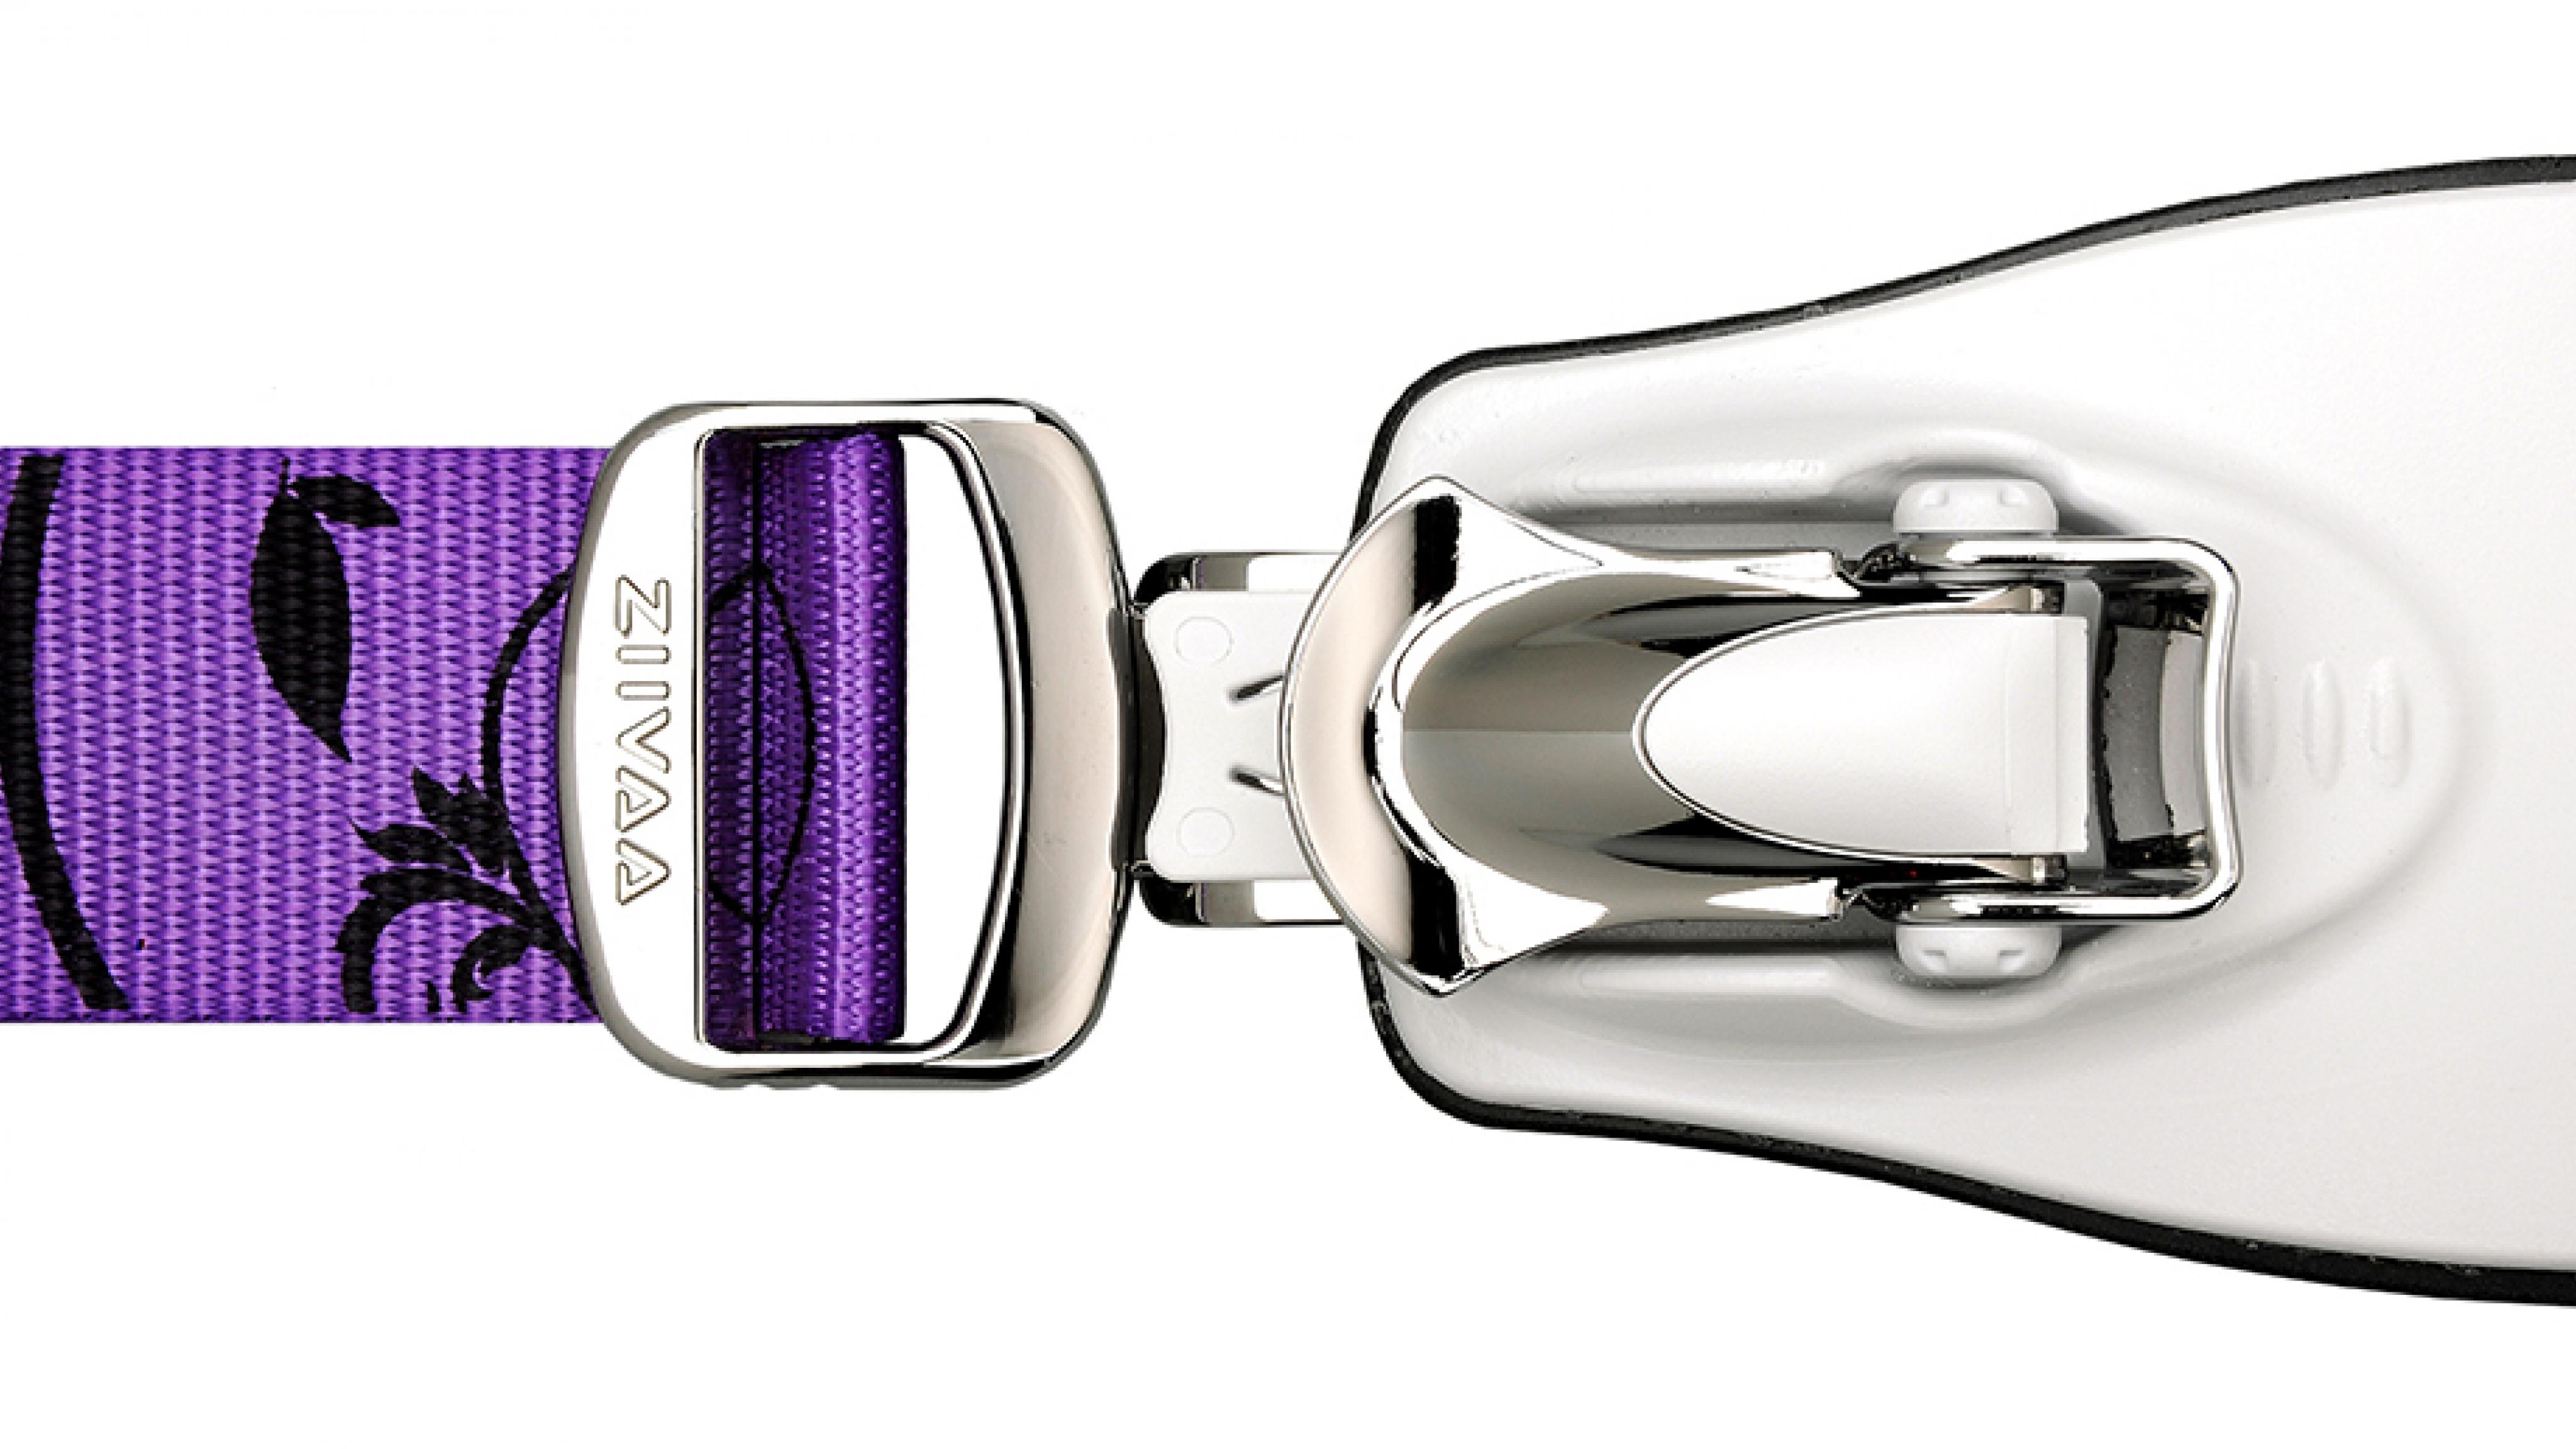 The Ziivaa Belt | ROBRADY design